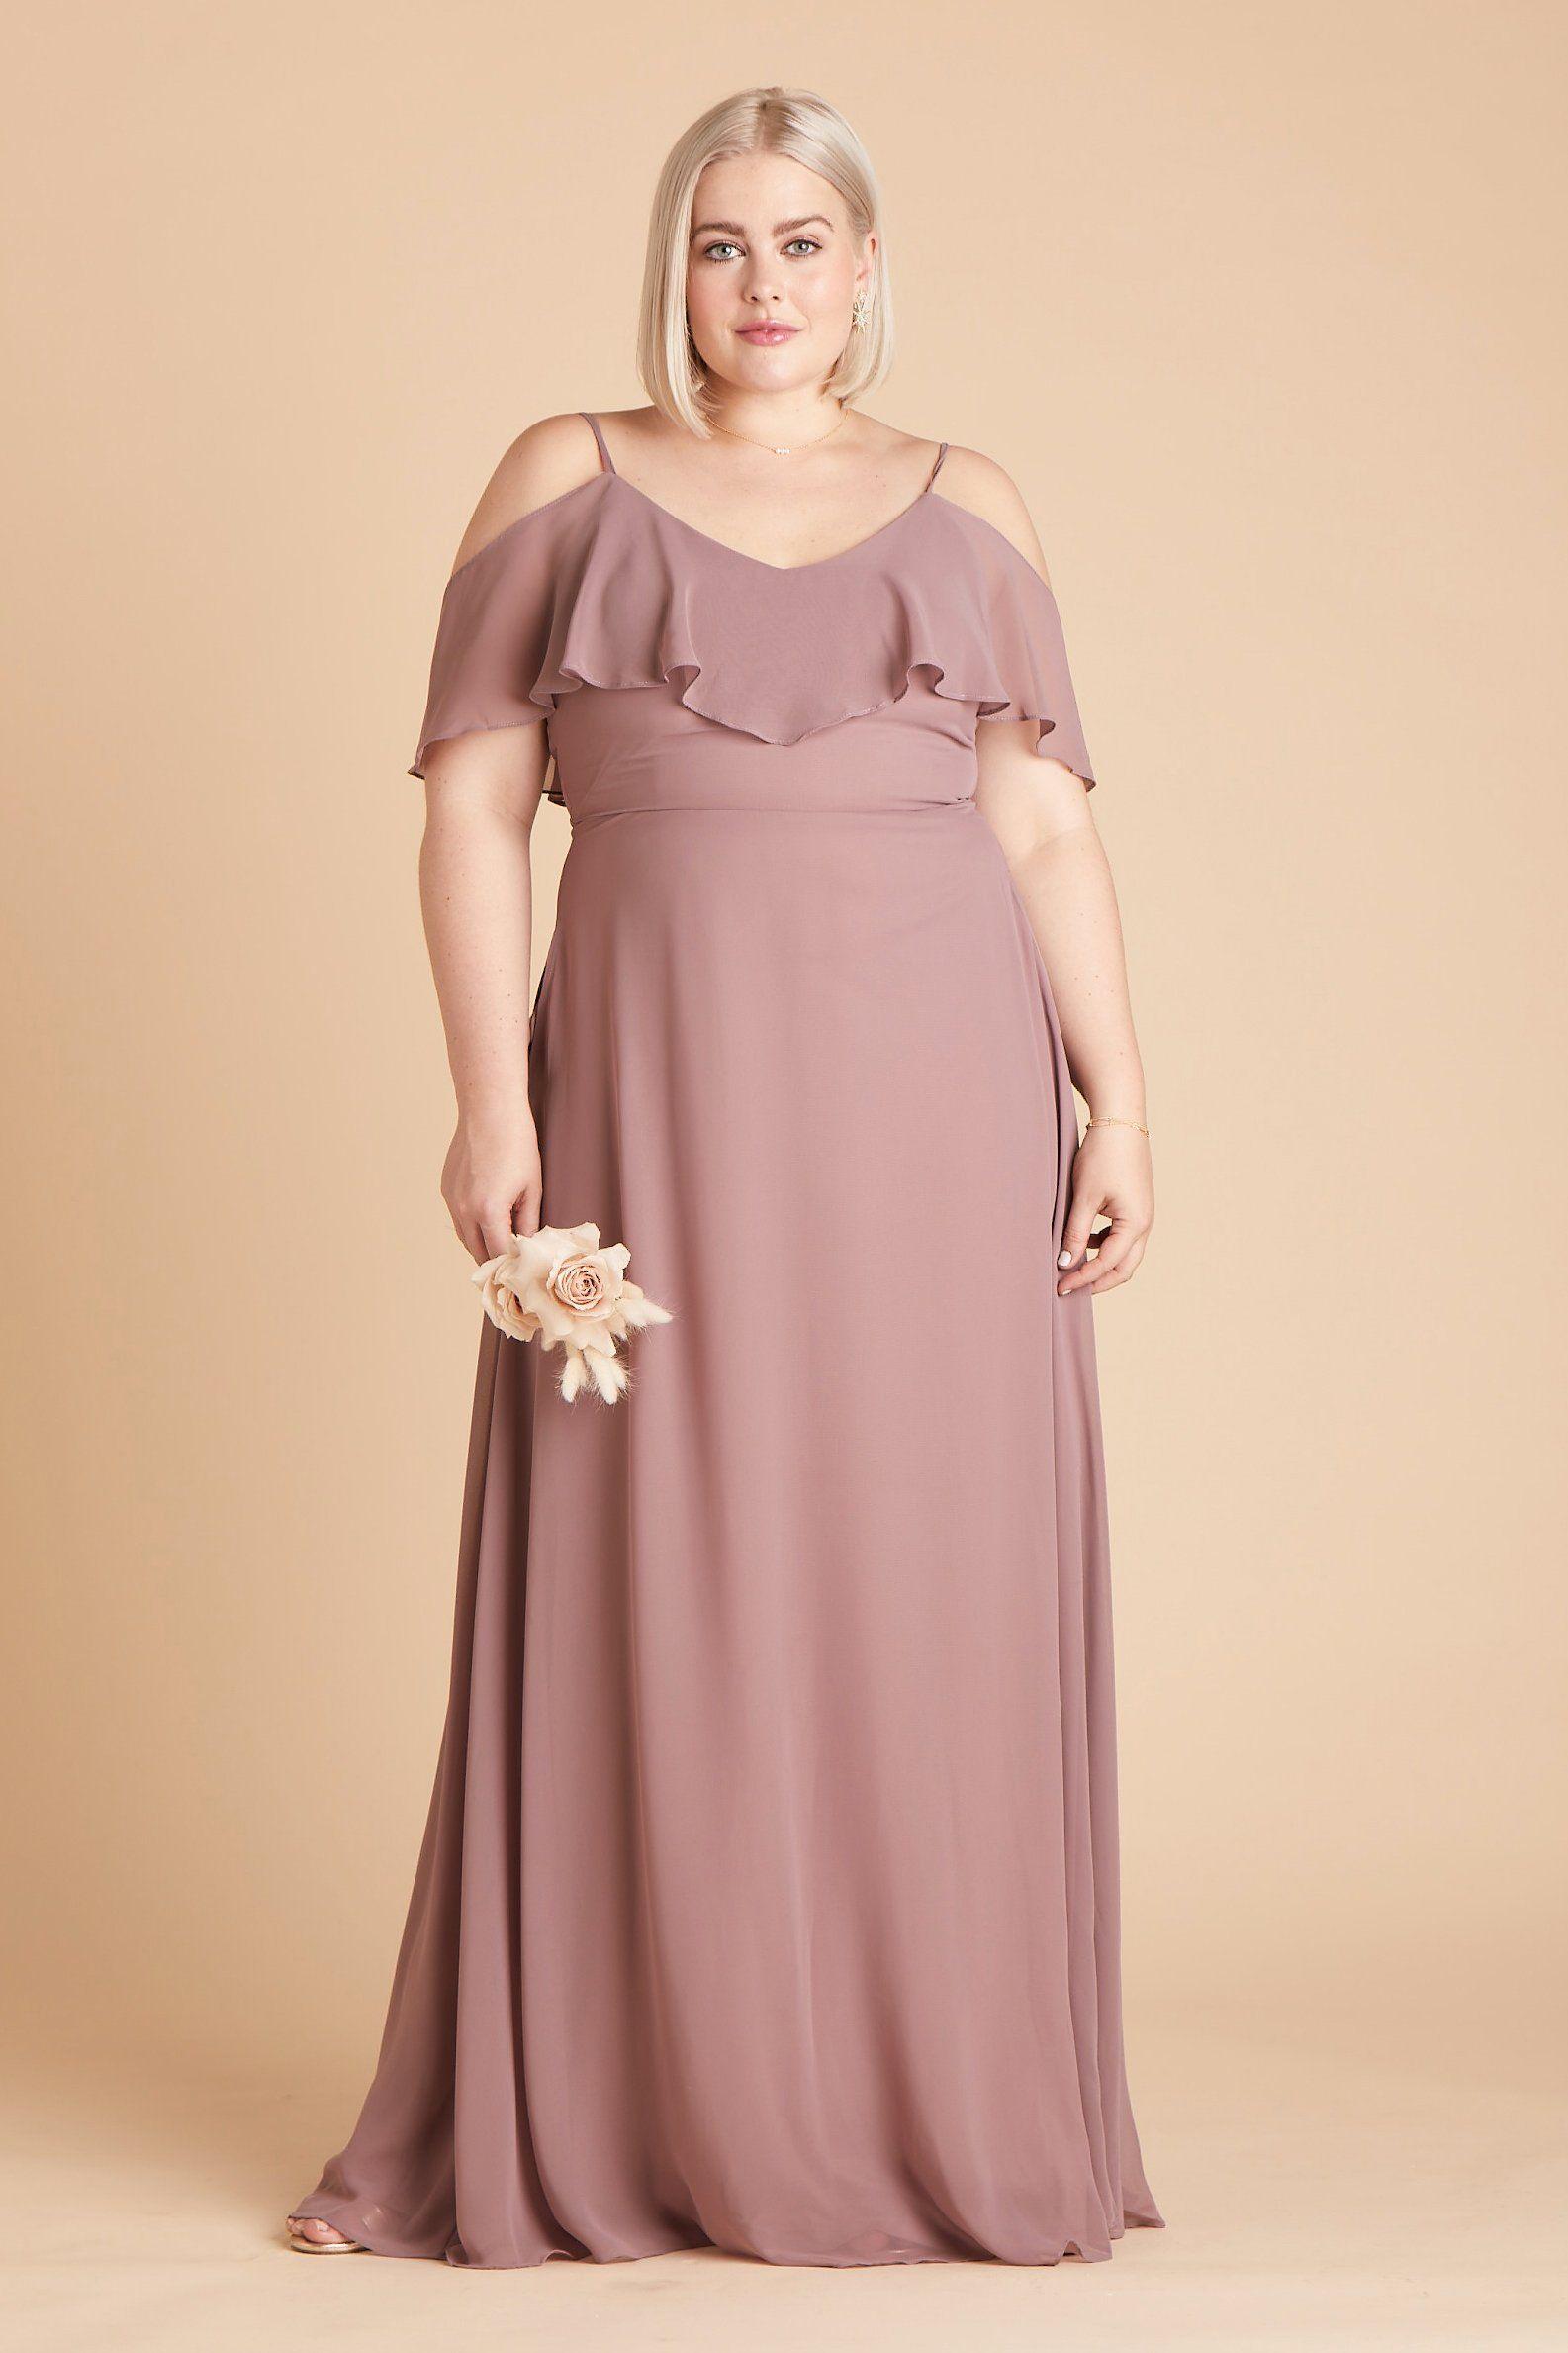 Jane Convertible Dress Curve Dark Mauve In 2021 Bridesmaid Dresses Plus Size Plus Size Bridesmaid Mauve Bridesmaid Dress [ 2378 x 1585 Pixel ]